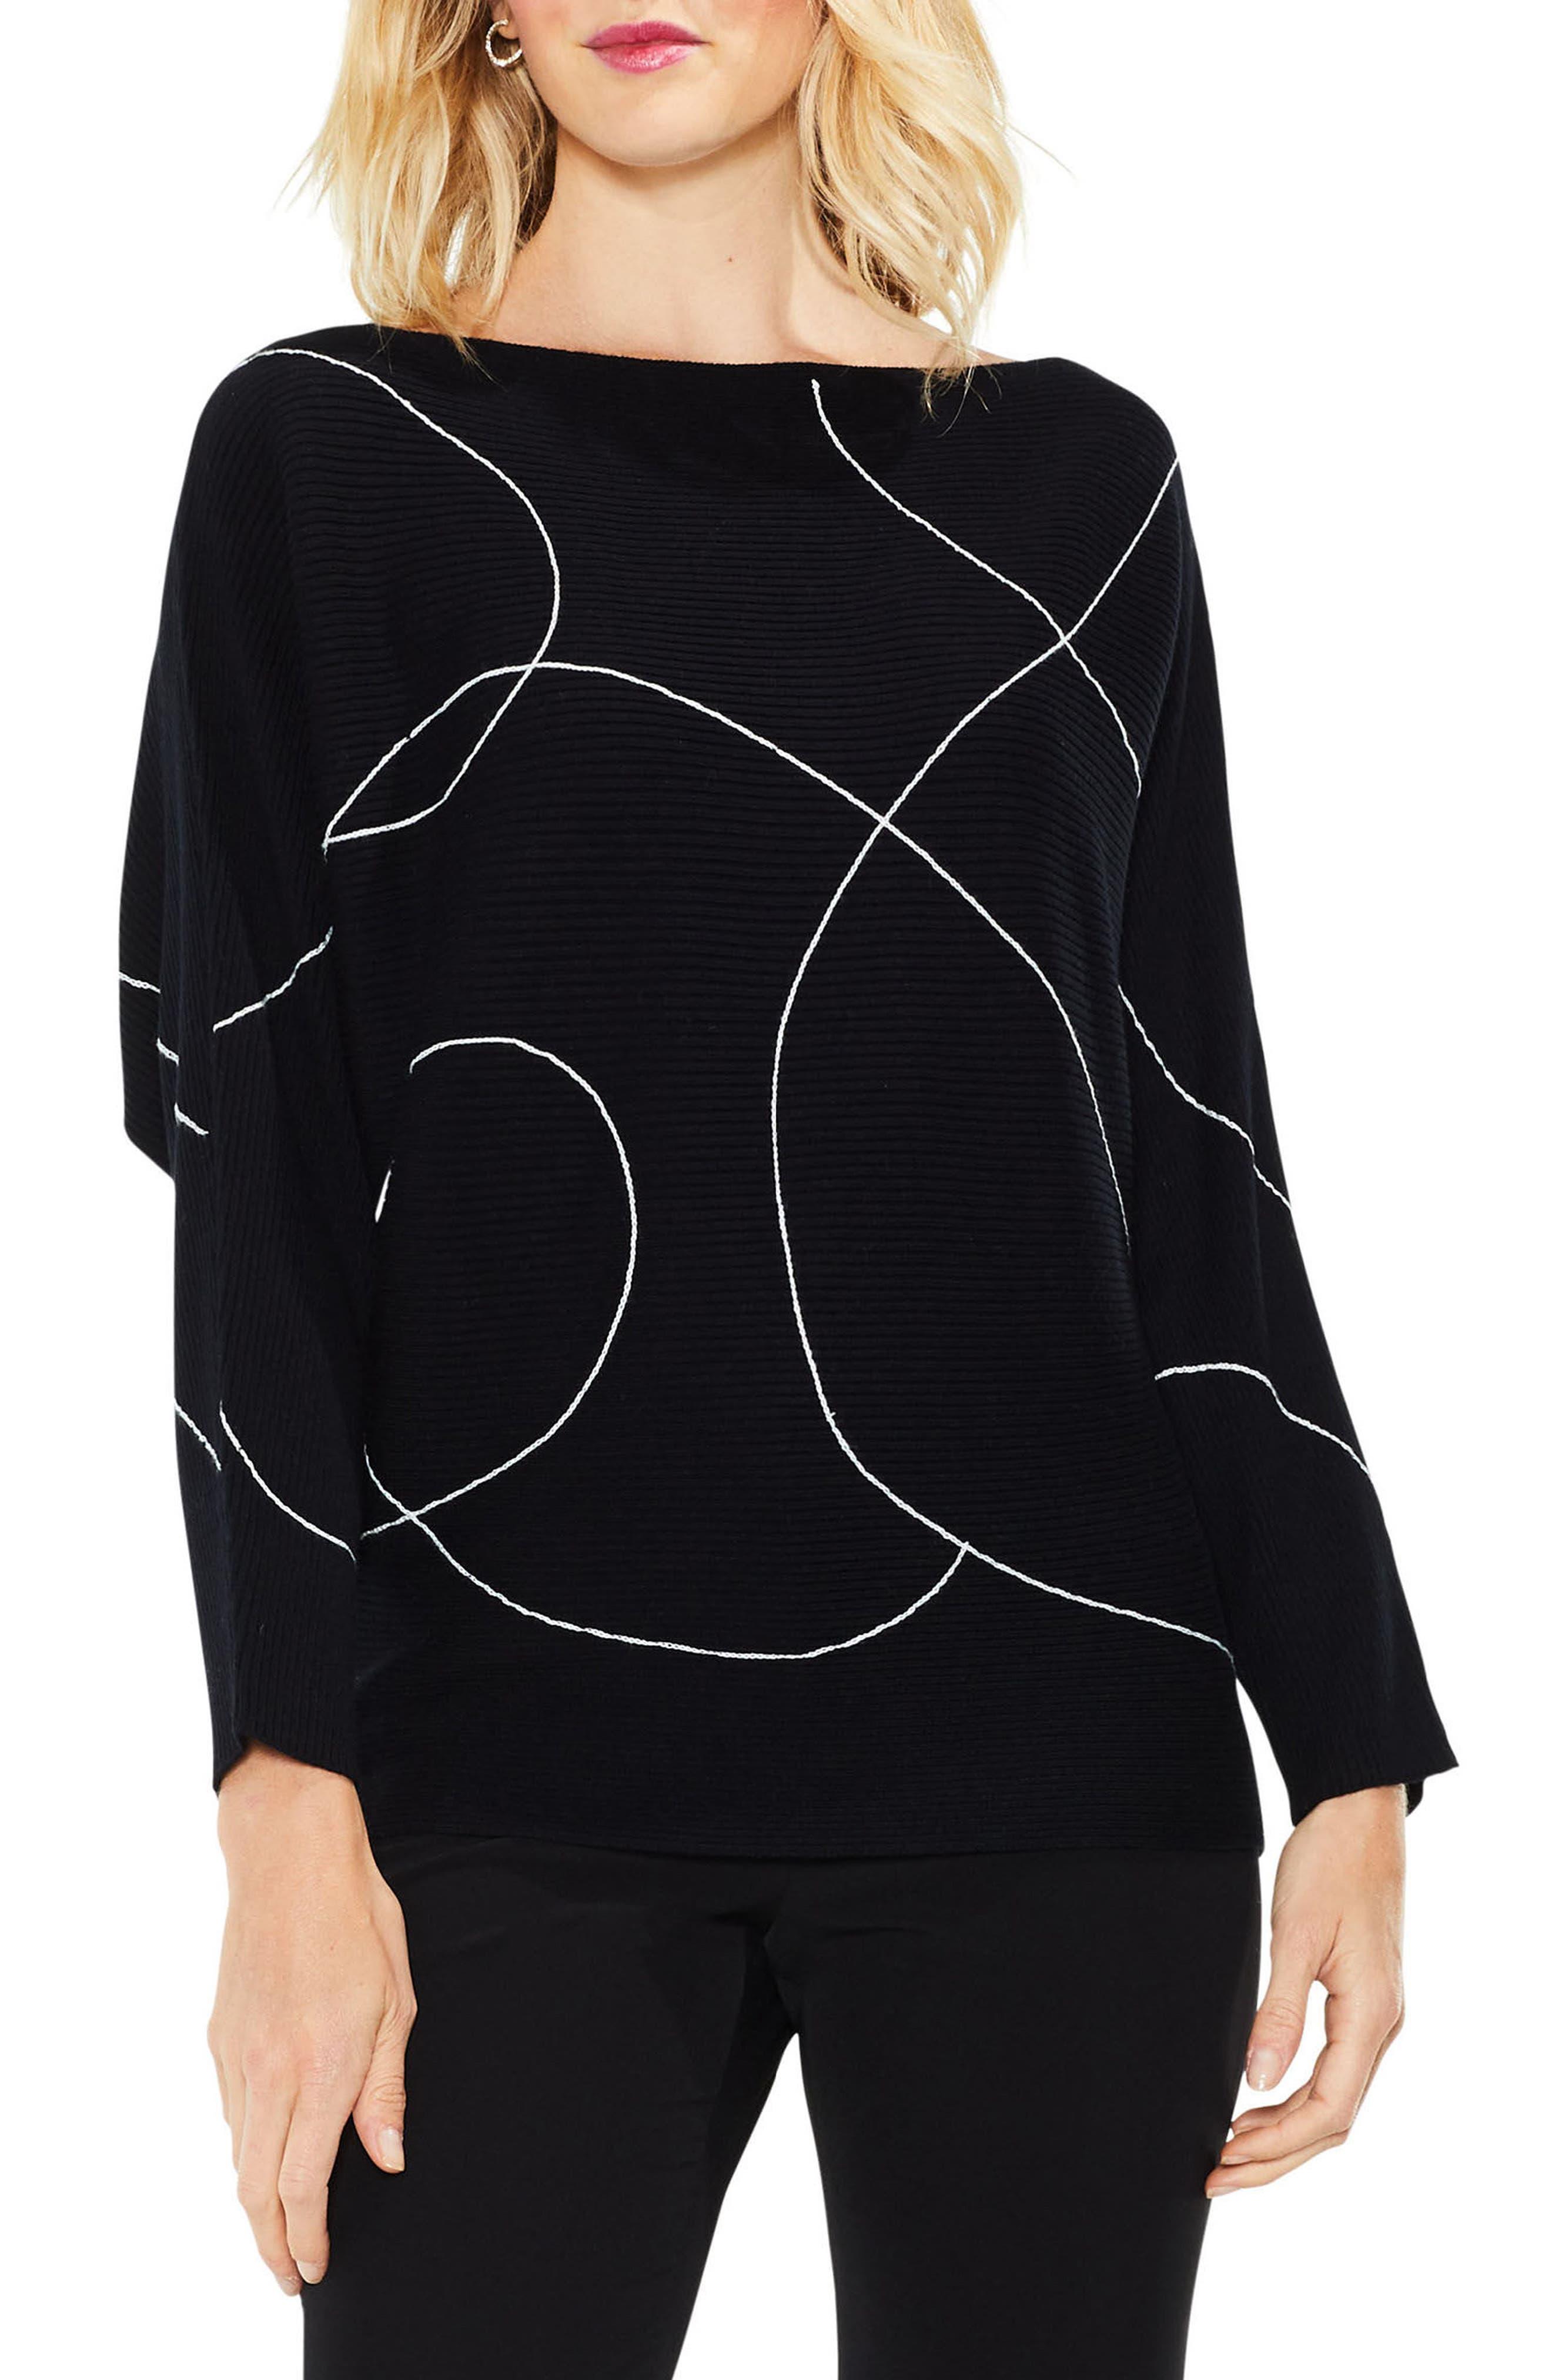 Vince Camuto Ink Swirl Ribbed Sweater (Regular & Petite)